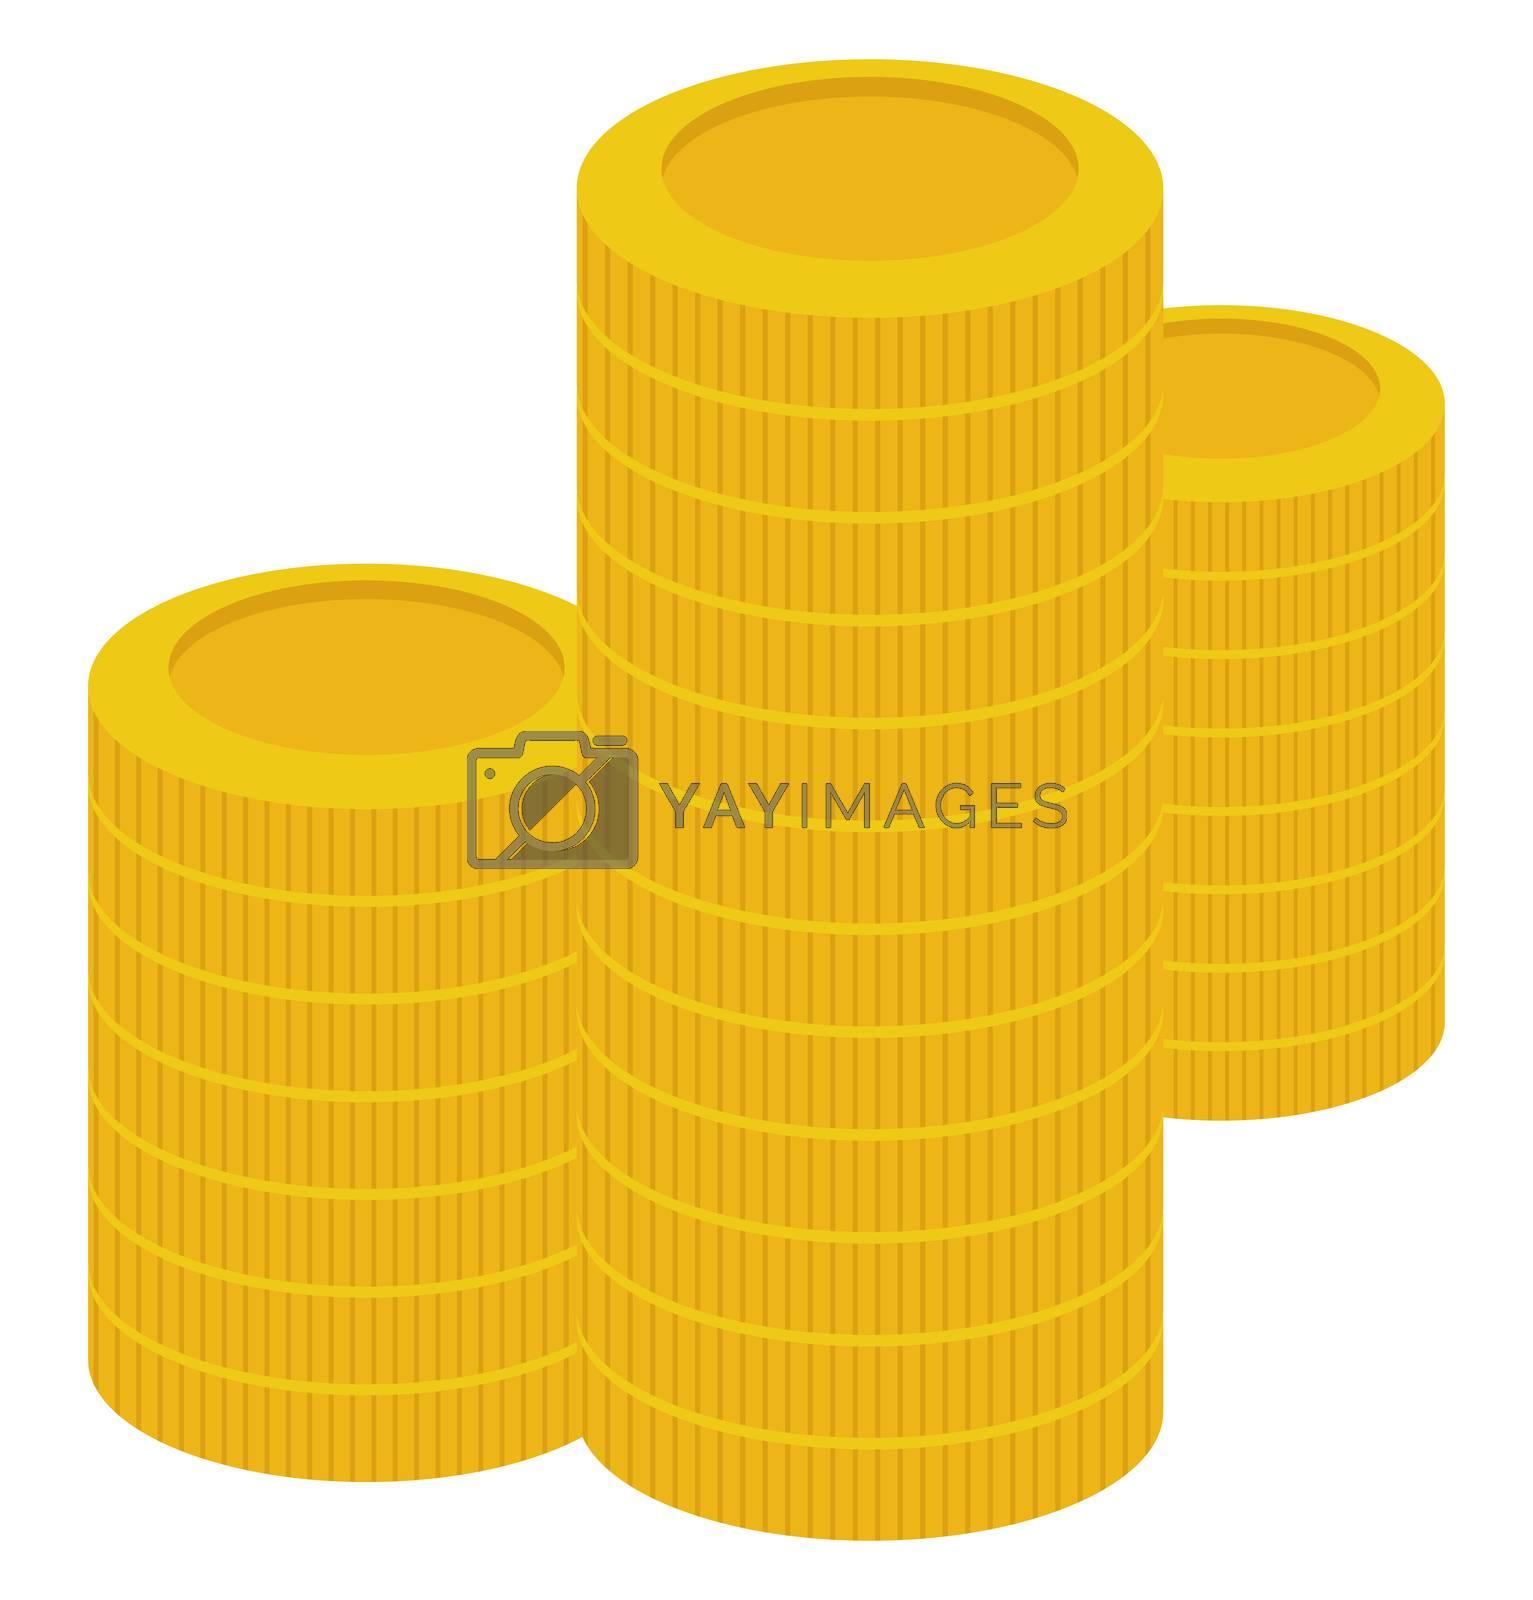 Money coins, illustration, vector on white background